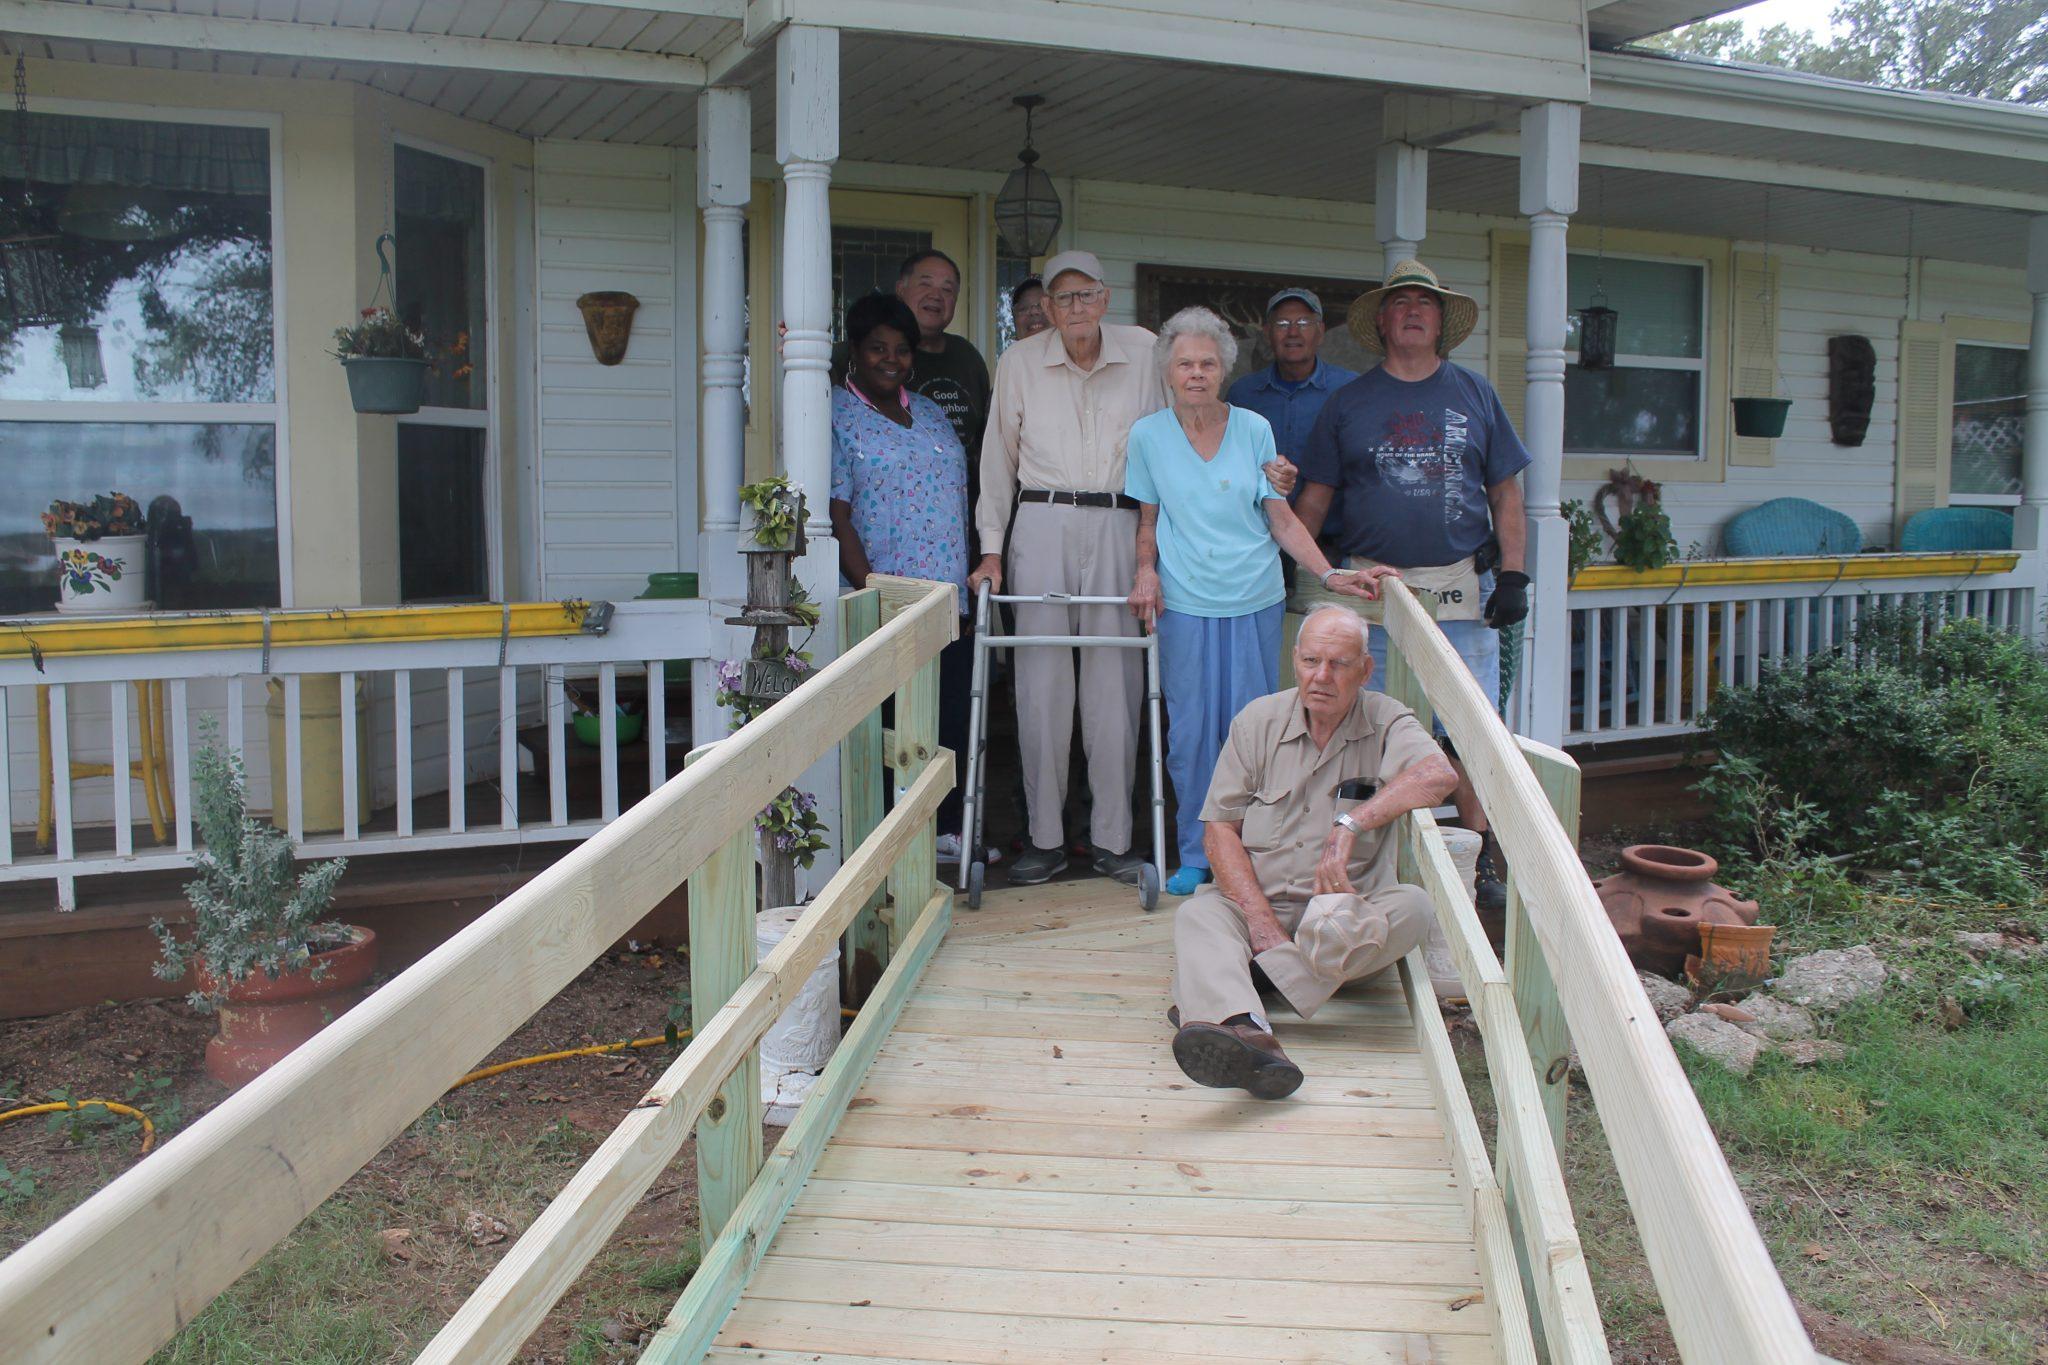 Home Waco Habitat For Humanity